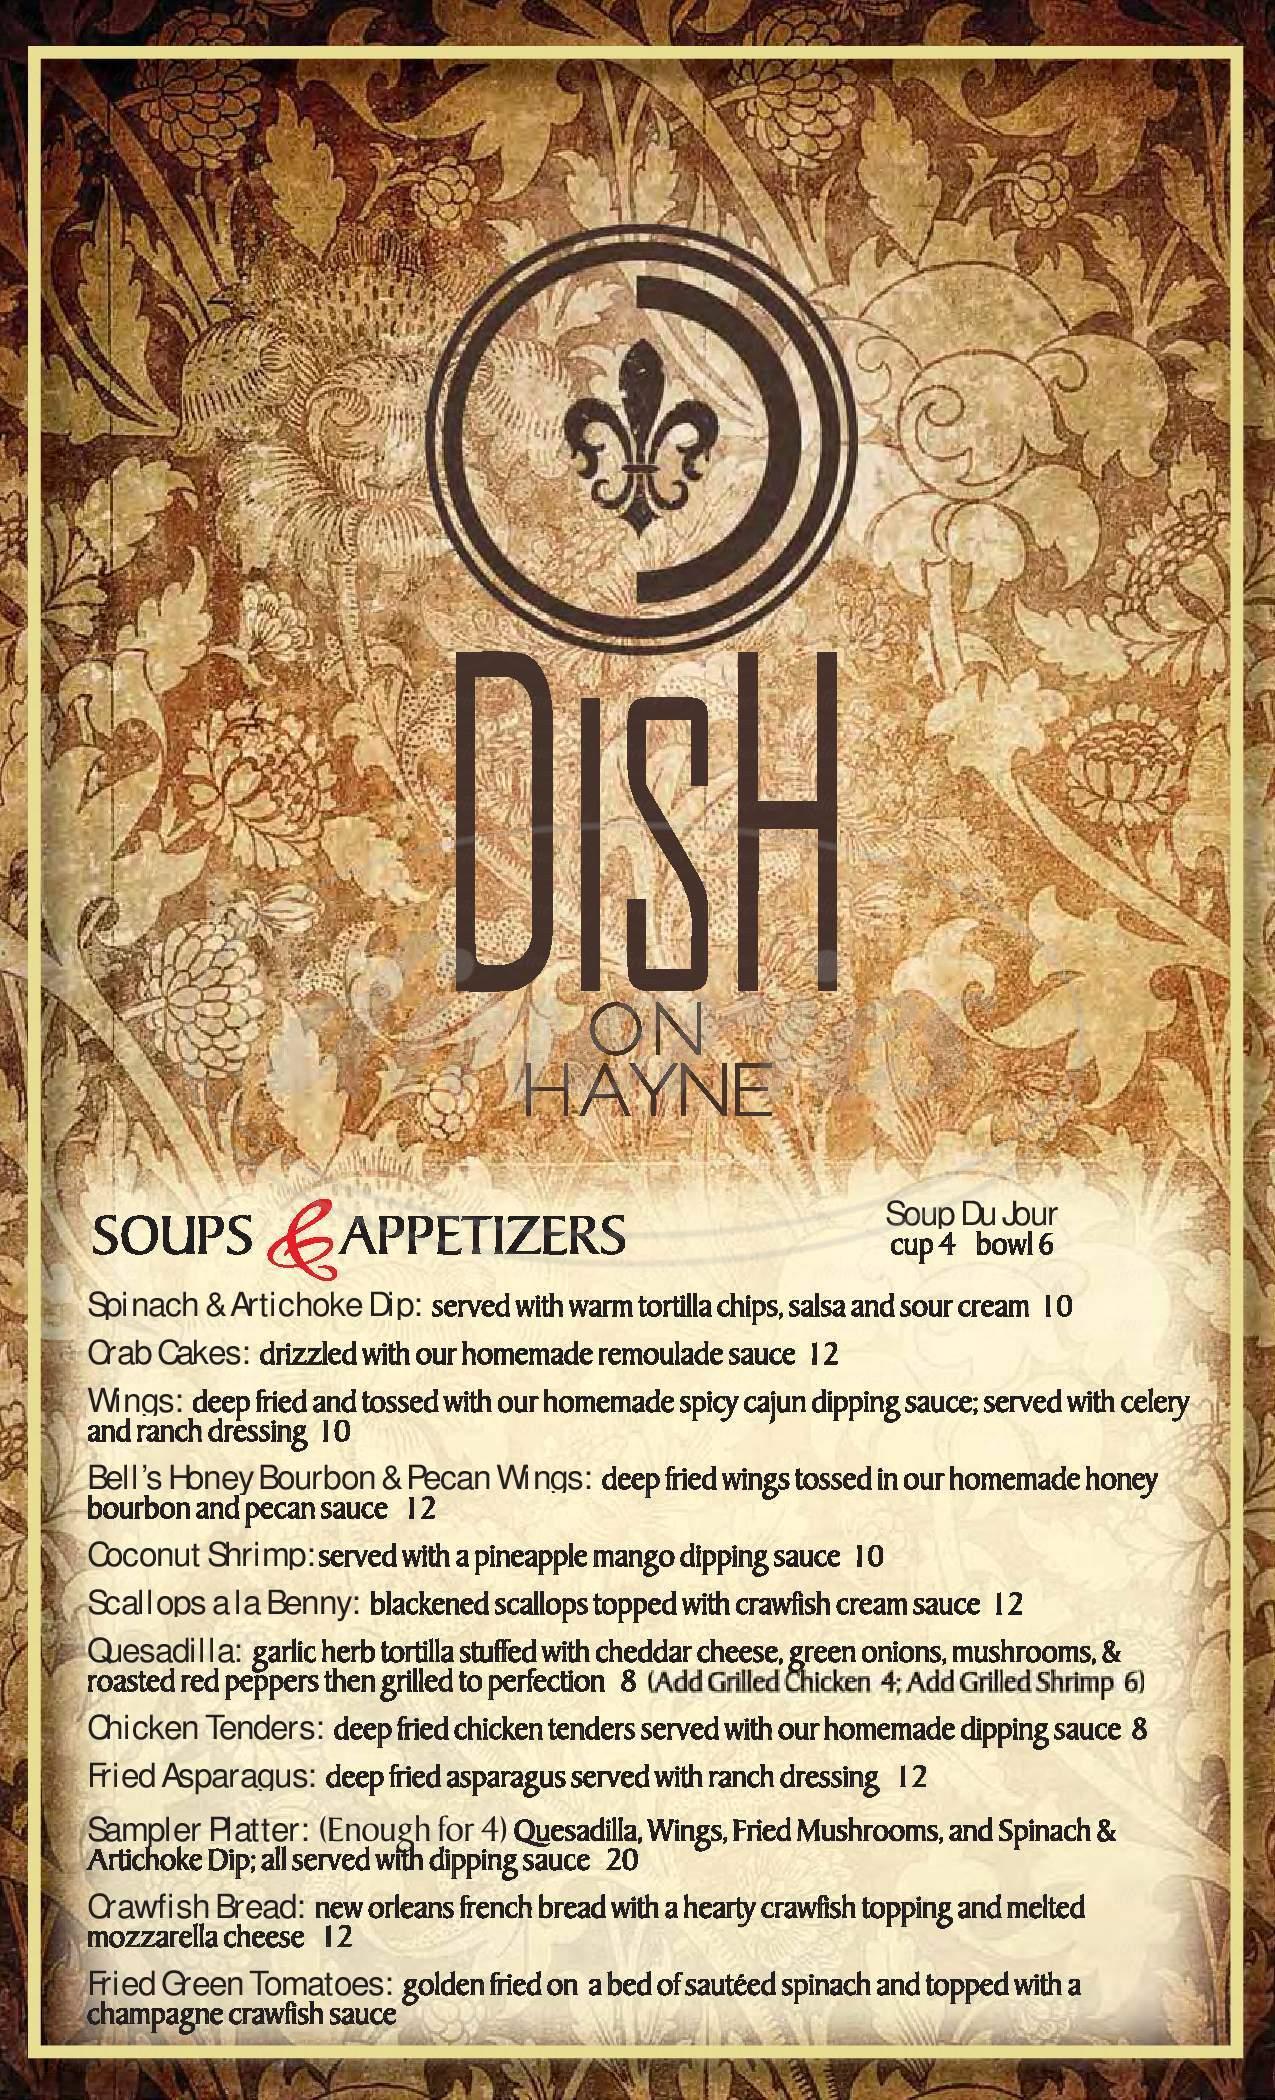 menu for Dish on Hayne